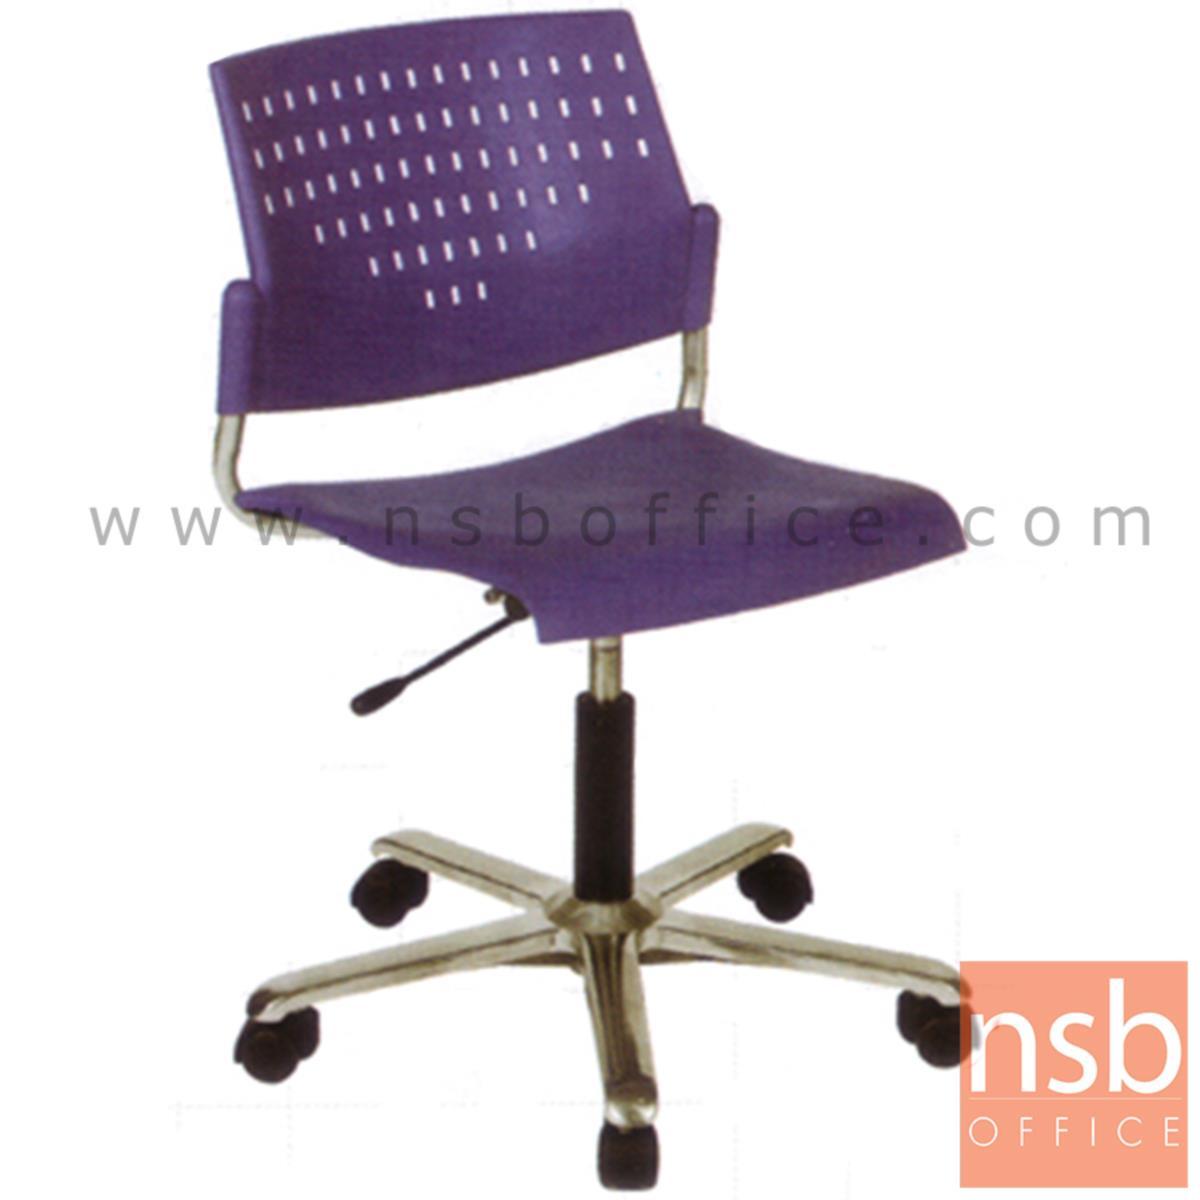 B21A005:เก้าอี้สำนักงานโพลี่ รุ่น P716  โช๊คแก๊ส ขาเหล็กชุบโครเมี่ยม